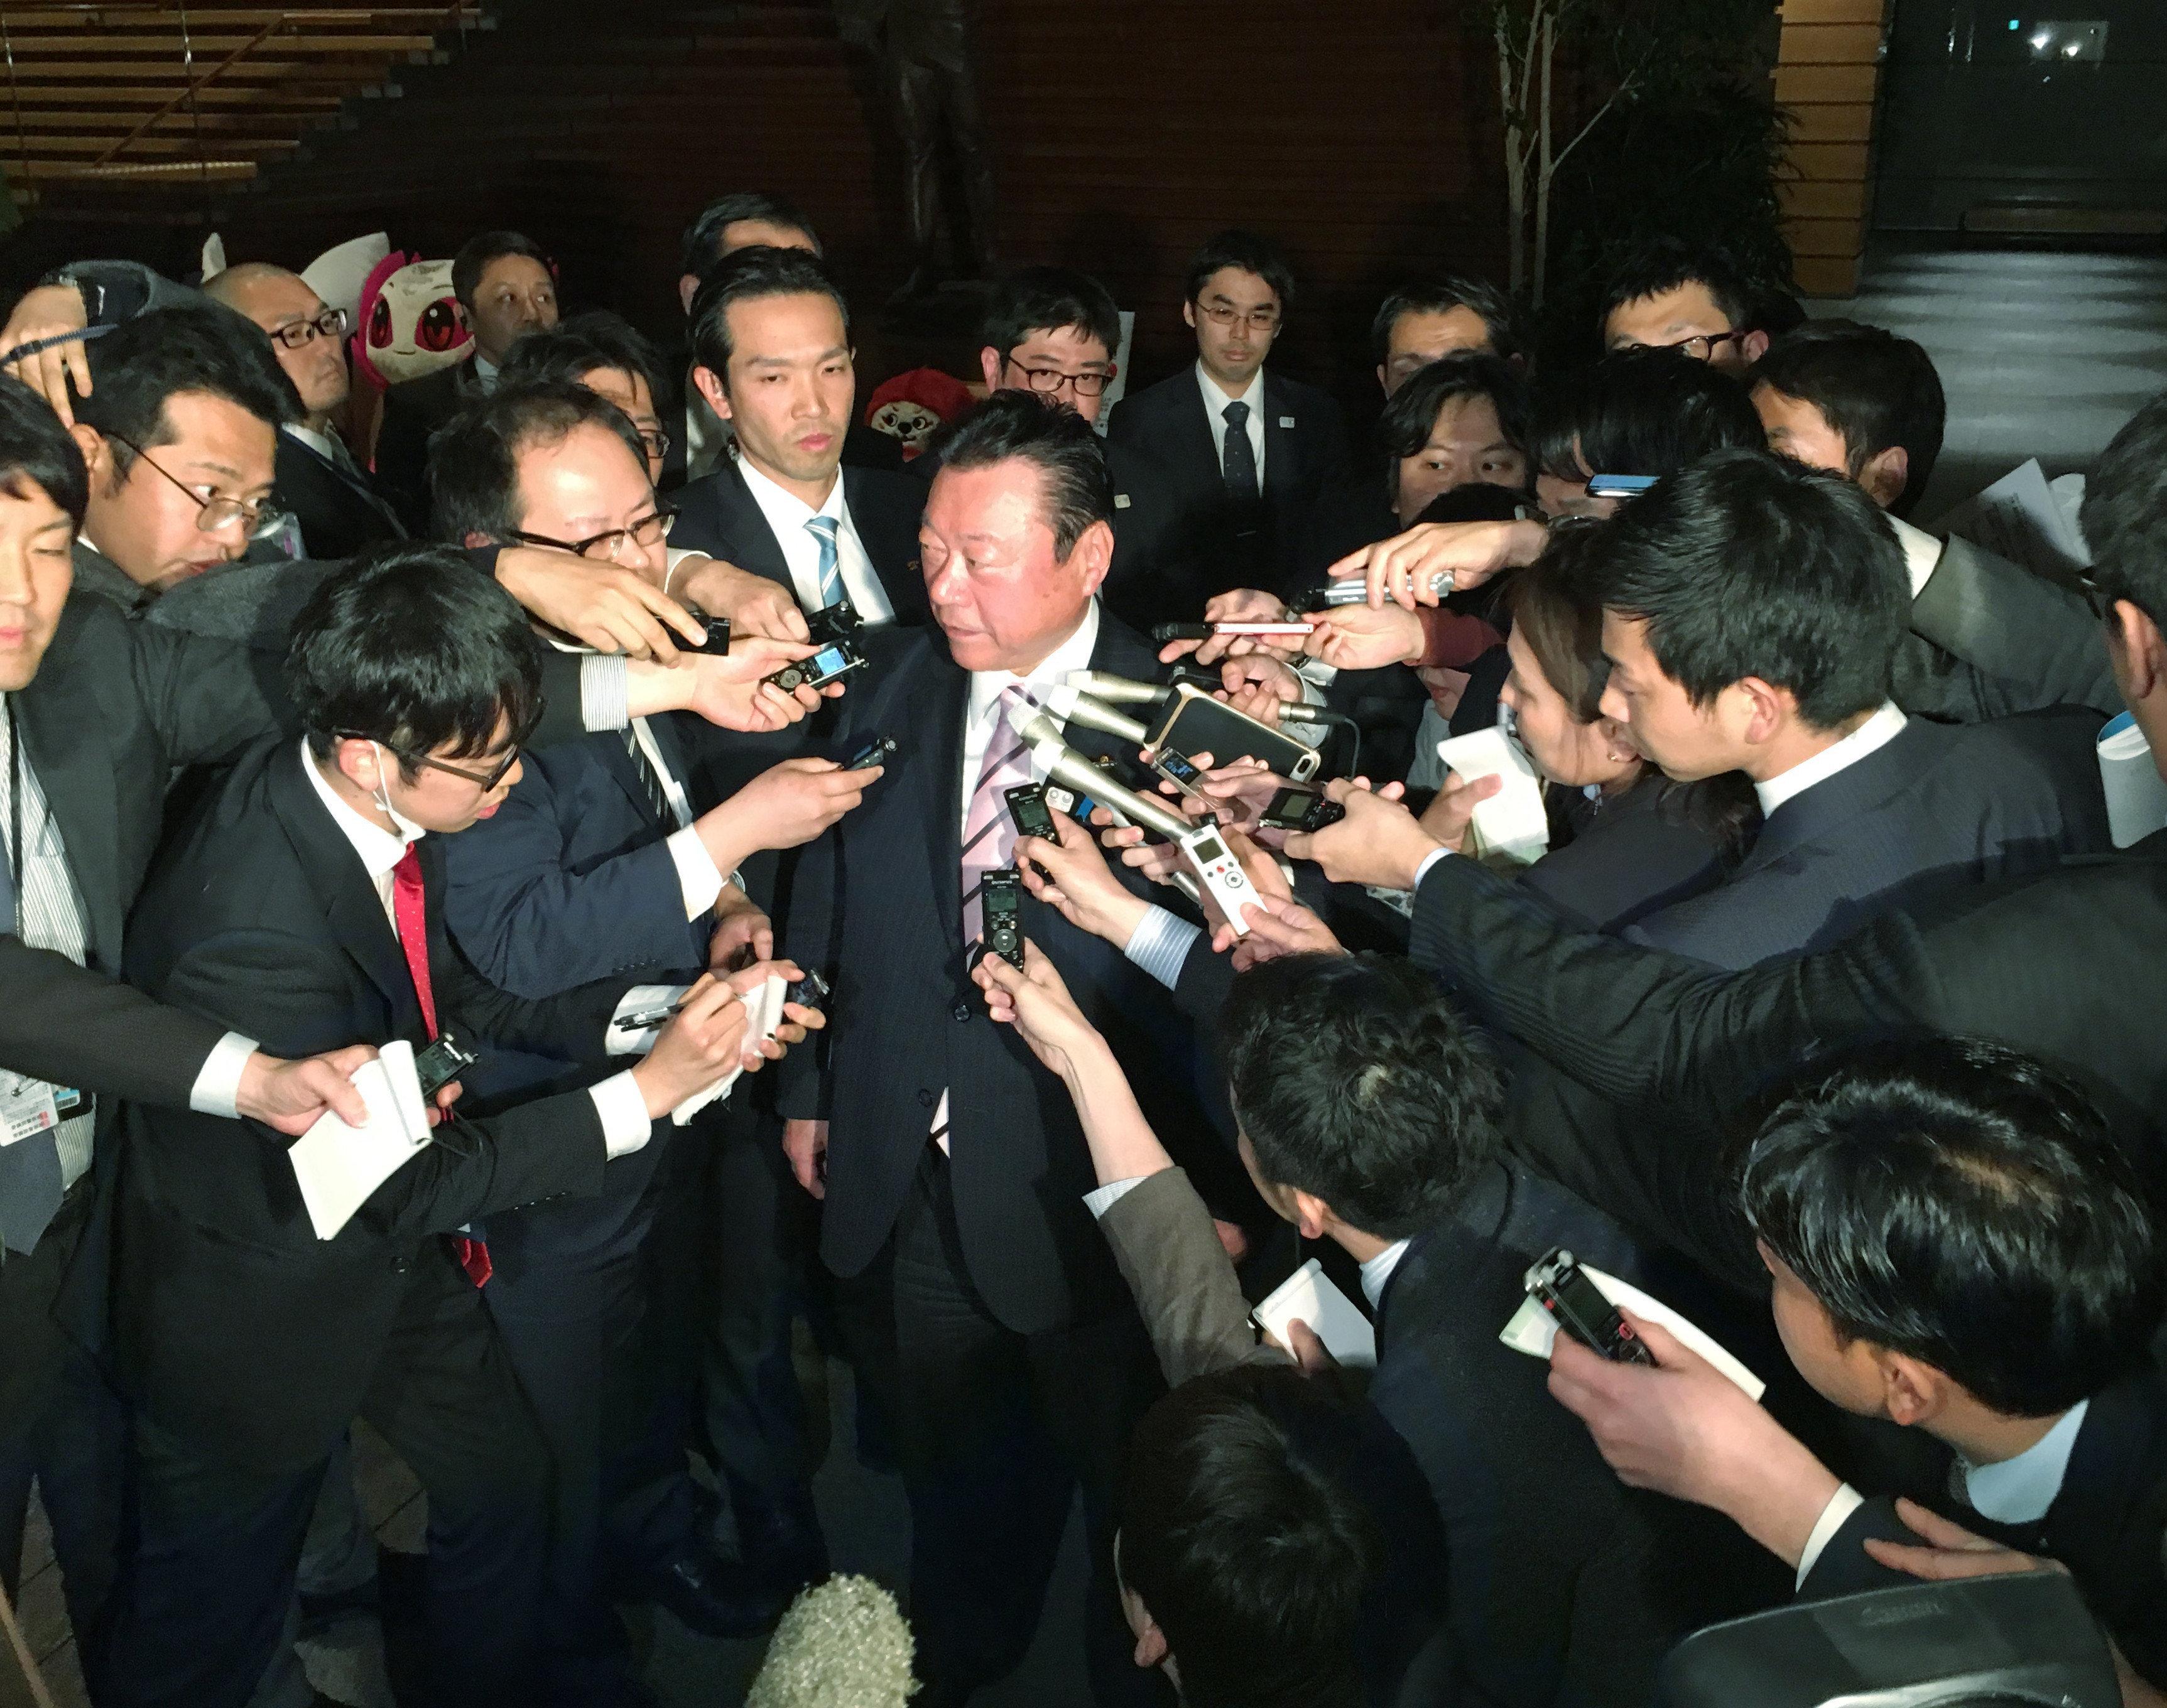 辞表を提出後、取材に応じる桜田義孝五輪担当相(中央)=2019年04月10日夜、首相官邸